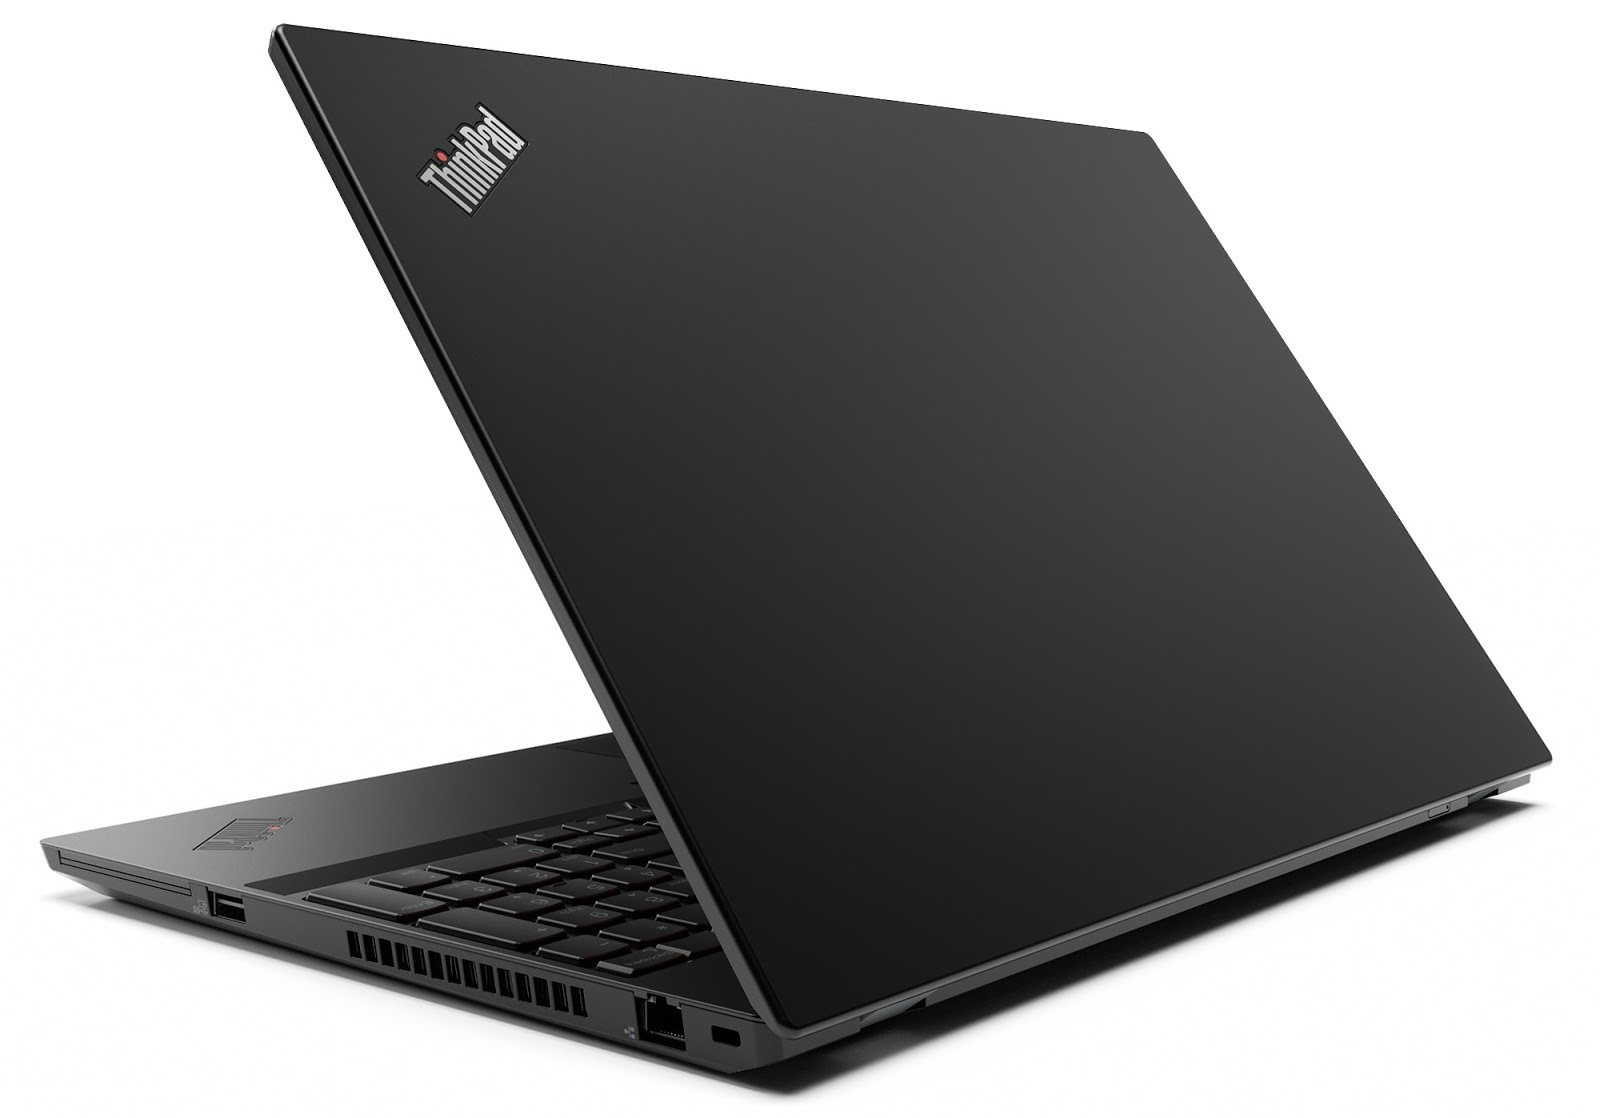 Фото 2. Рабочая станция Lenovo ThinkPad T15 Gen 2 (20W4003FRT)